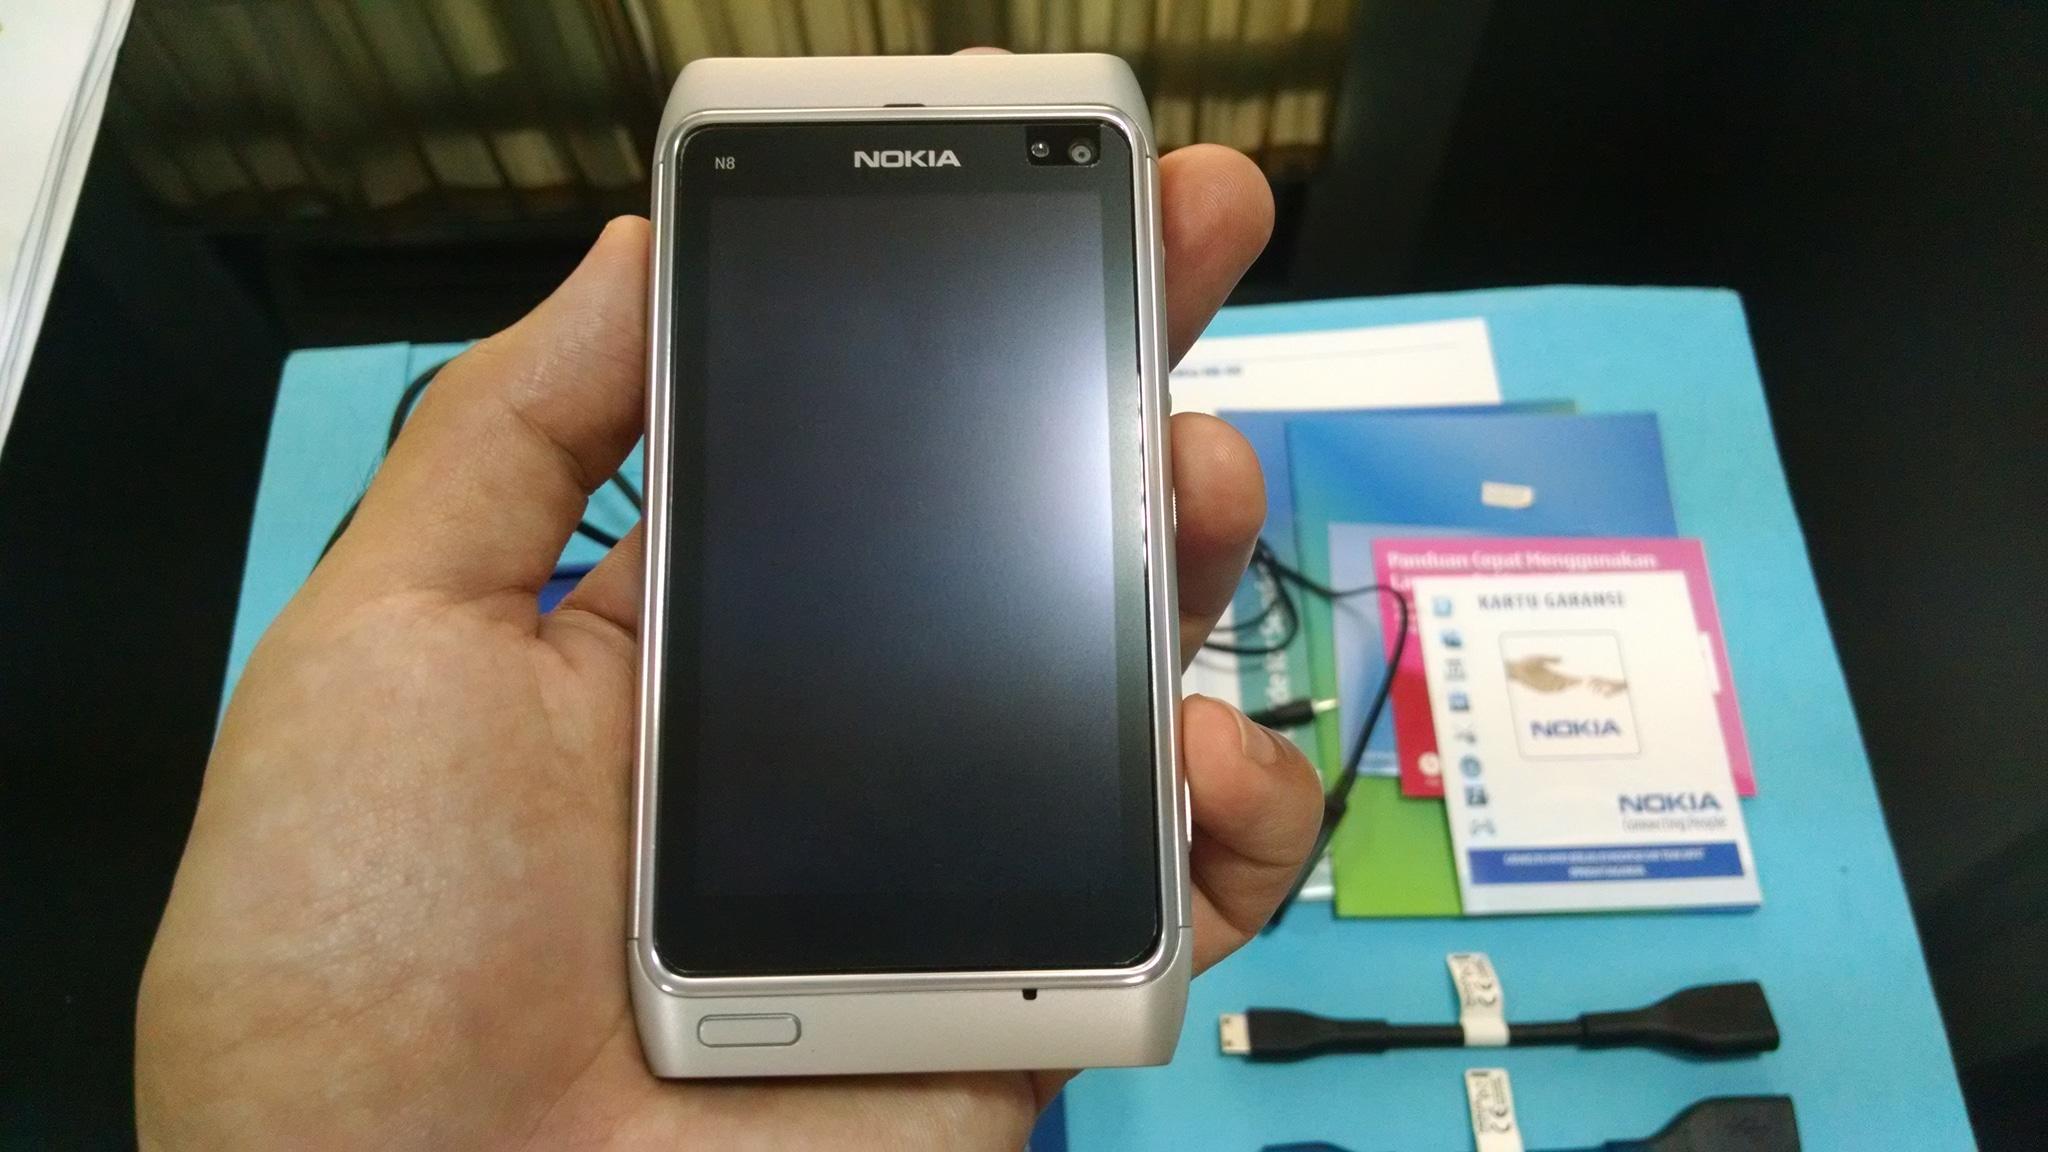 Nokia N8 Resmi Biru Bnob6 Cek Harga Terkini Dan Terlengkap Indonesia 130 Tam Erajaya Ex Display Jual Hp Fullsett Mulus Seperti Baru Raypedia Tokopedia